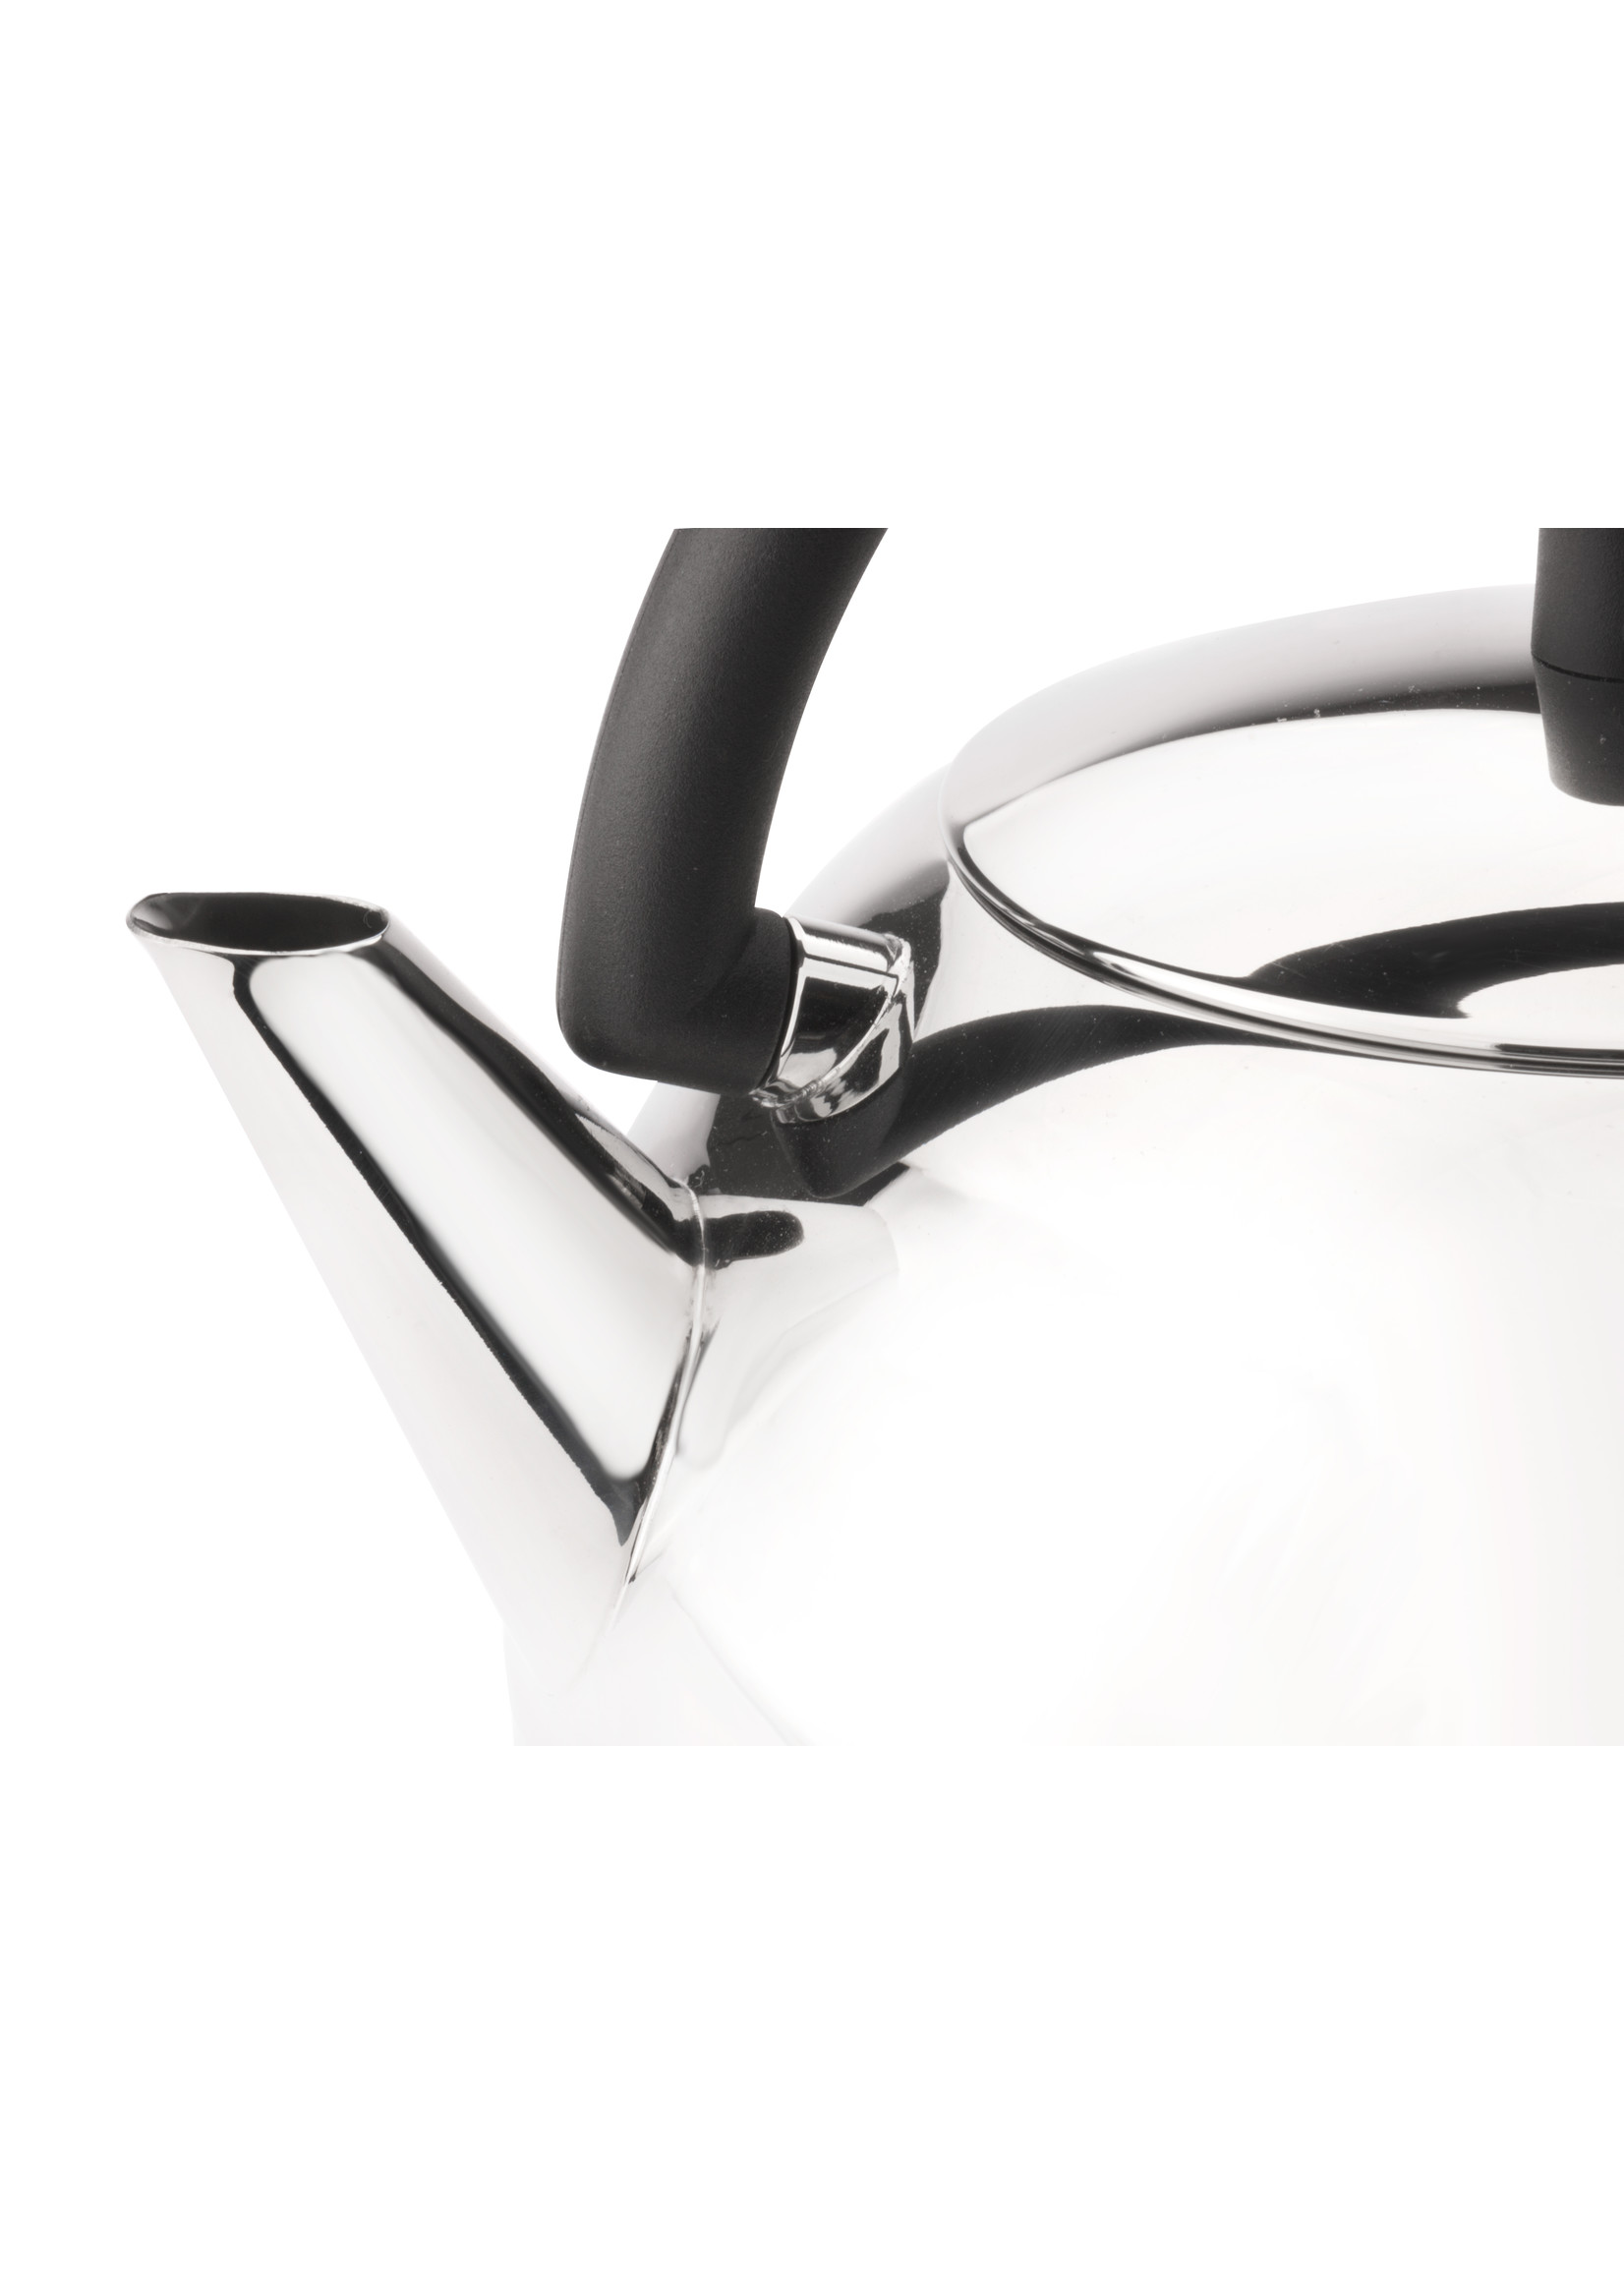 Bredemeijer Bredemeijer Theepot Duet® Design Saturn mat zwart 1,2L